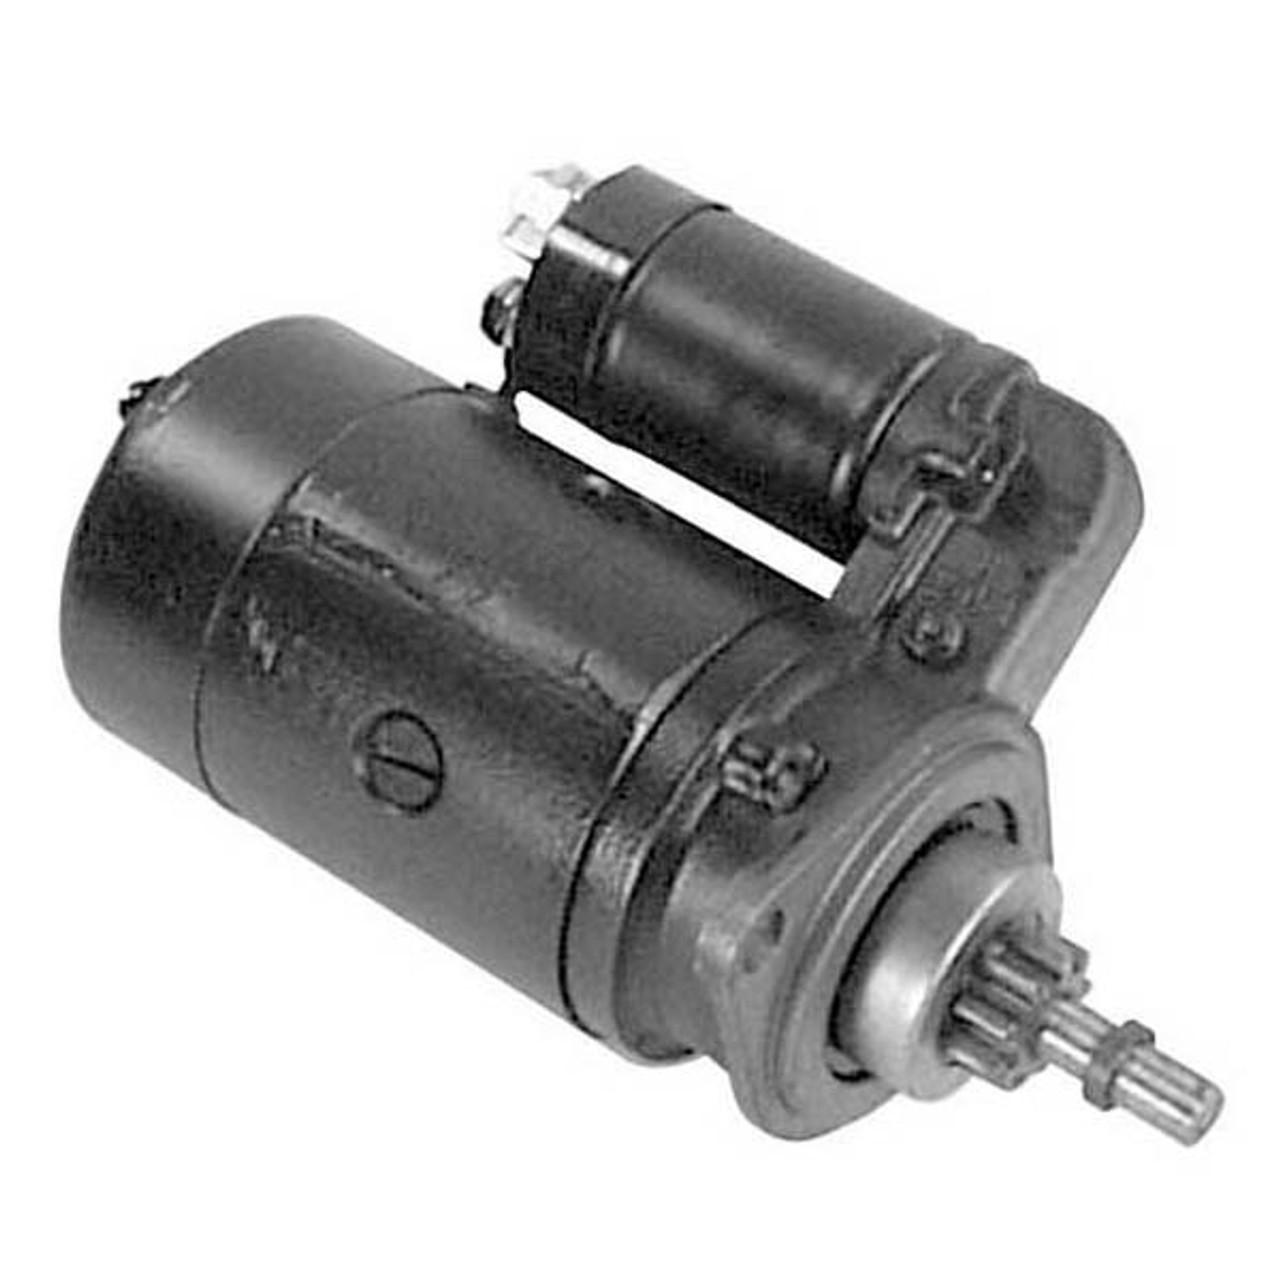 vw bug starter wiring bosch sr15x 12 volt starter fits fits vw bug ghia dune buggy vw bug starter solenoid wiring 12 volt starter fits fits vw bug ghia